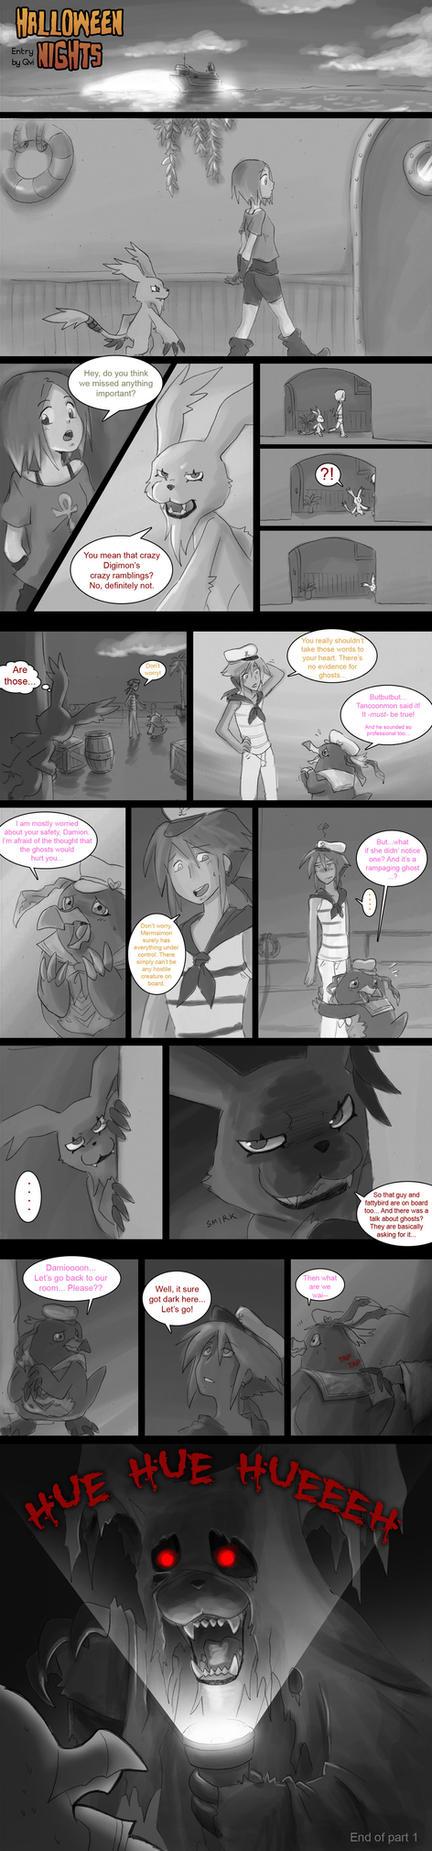 Halloween Nights comic pt 1 by Qvi